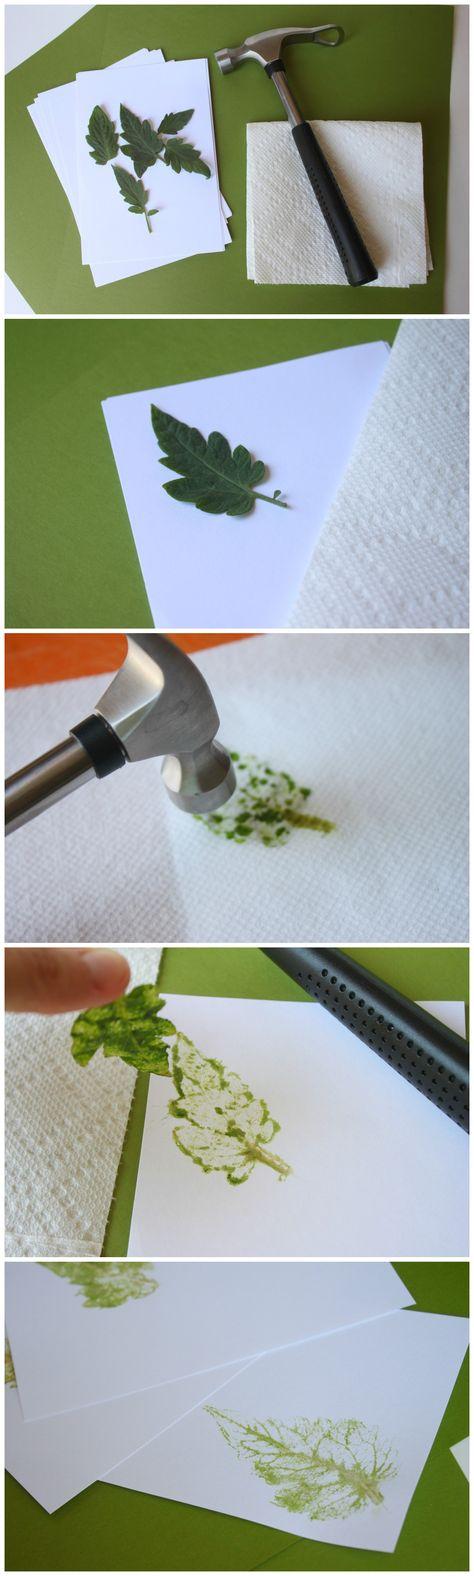 Make cards with leaf prints! Genius